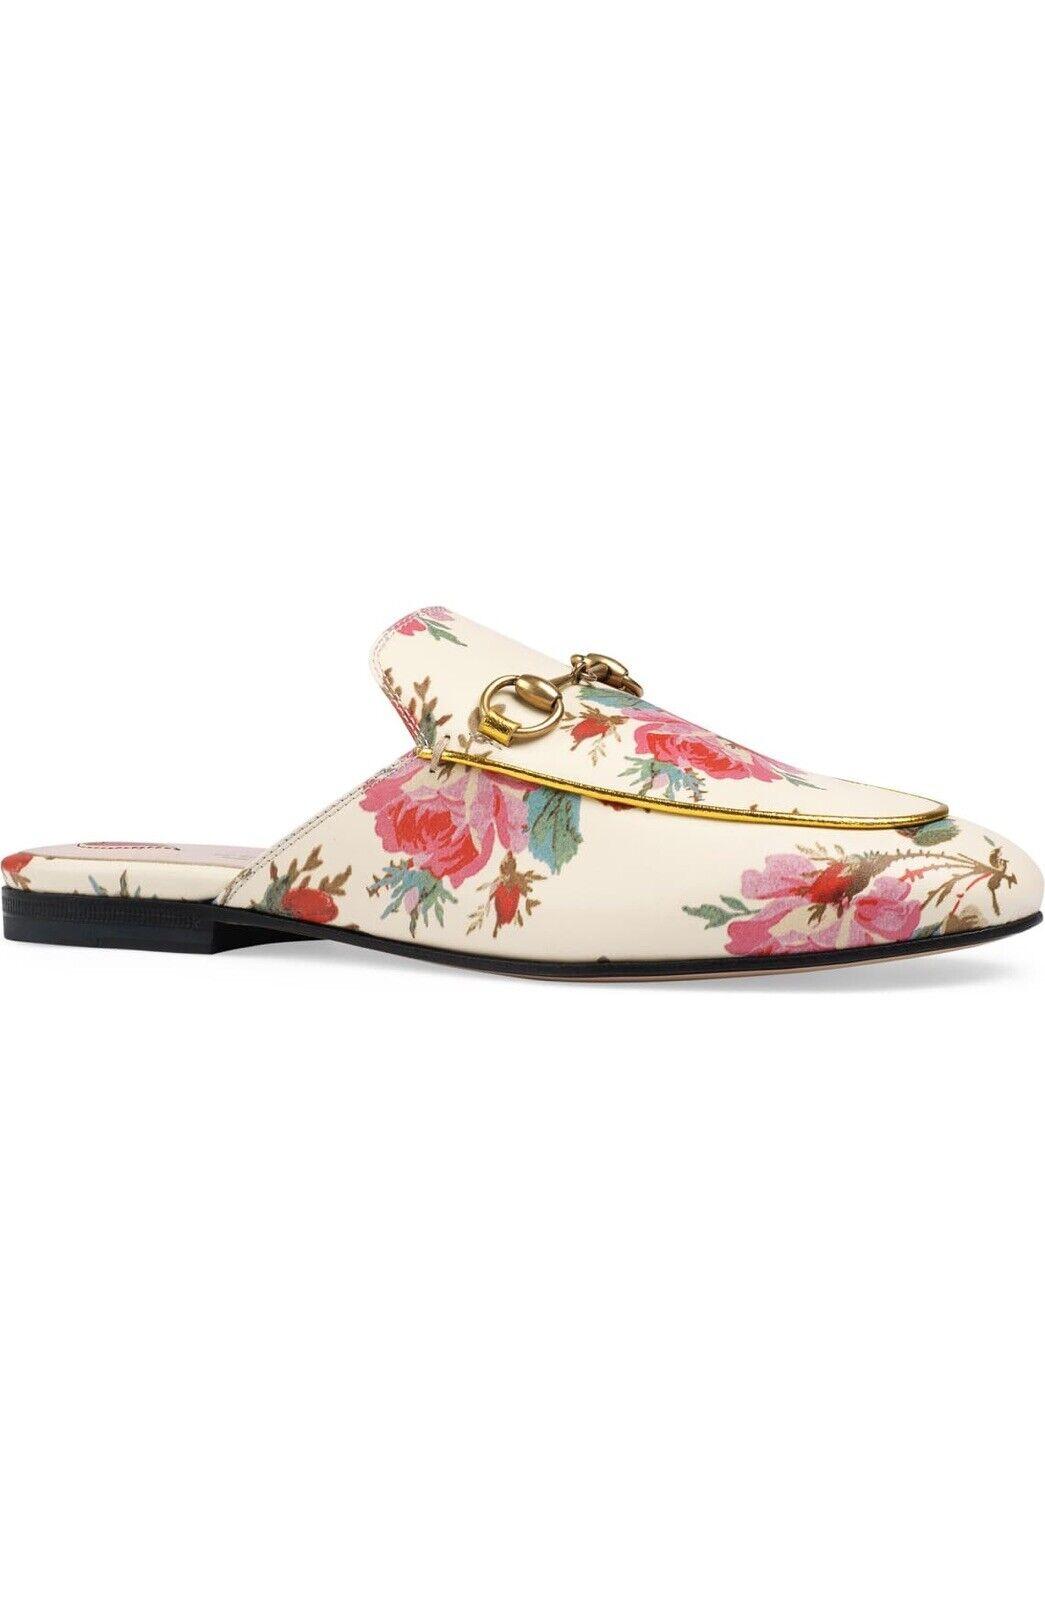 Rare Gucci Women Princetown Rose Floral Loafer Mu… - image 1